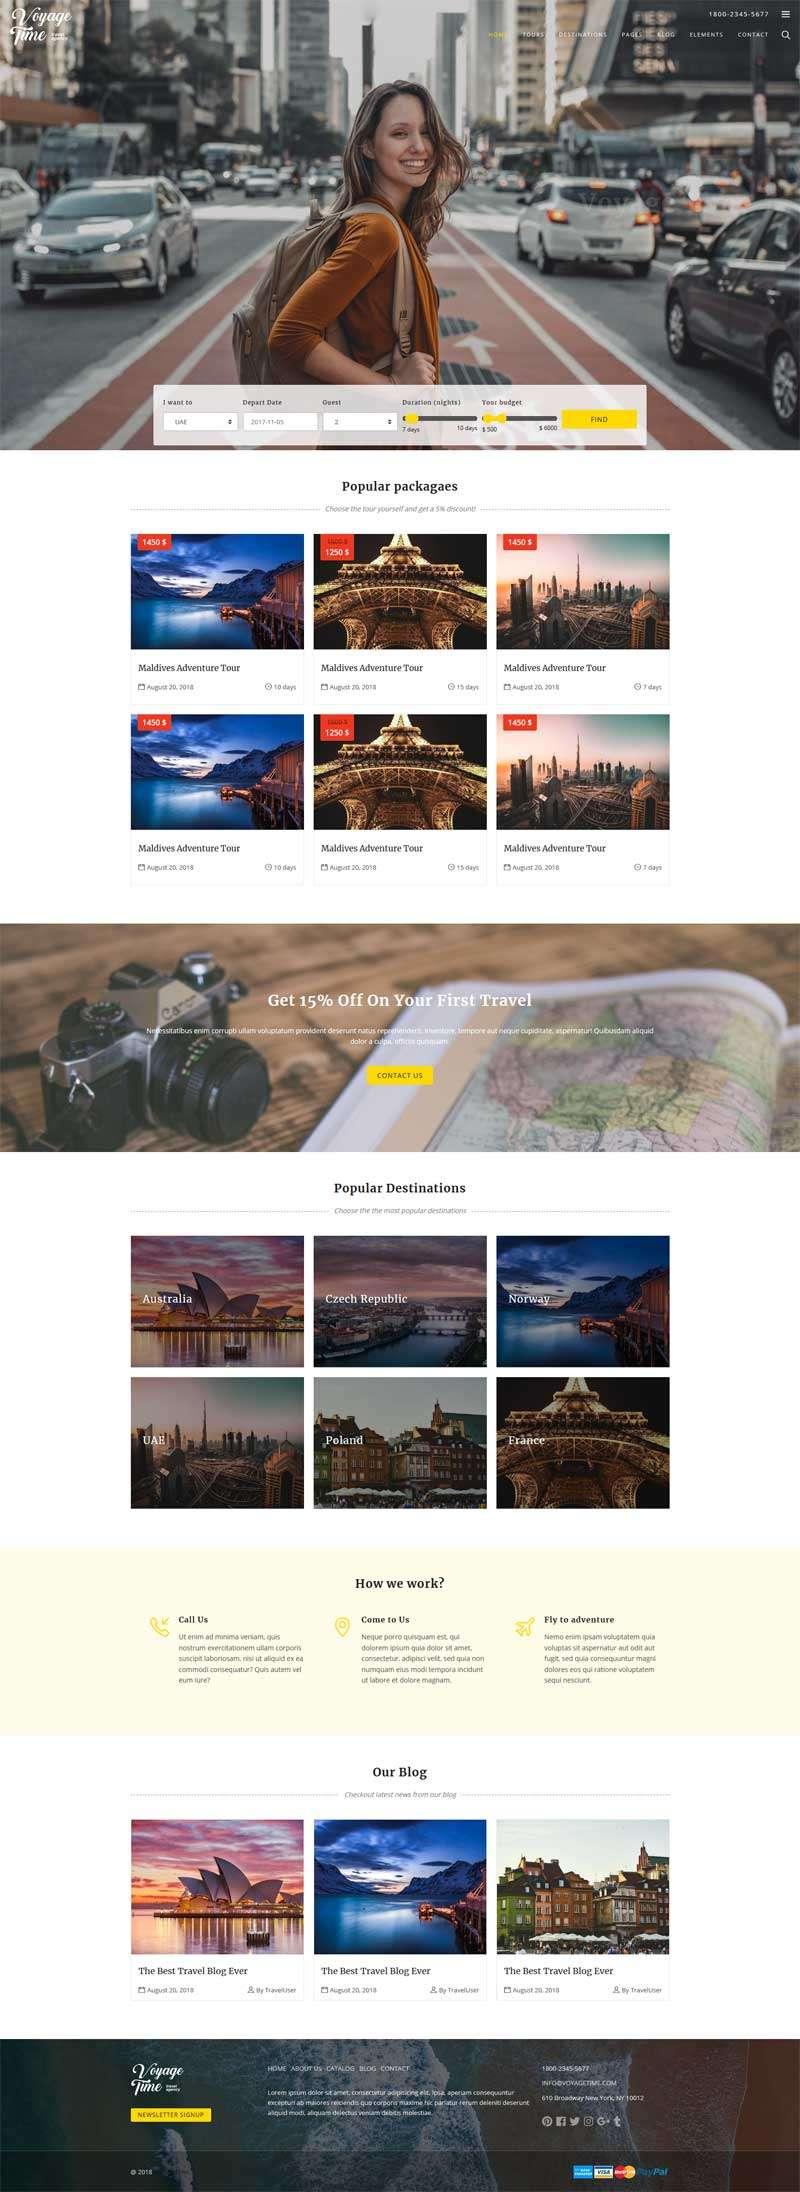 Bootstrap旅行社旅游公司网站模板